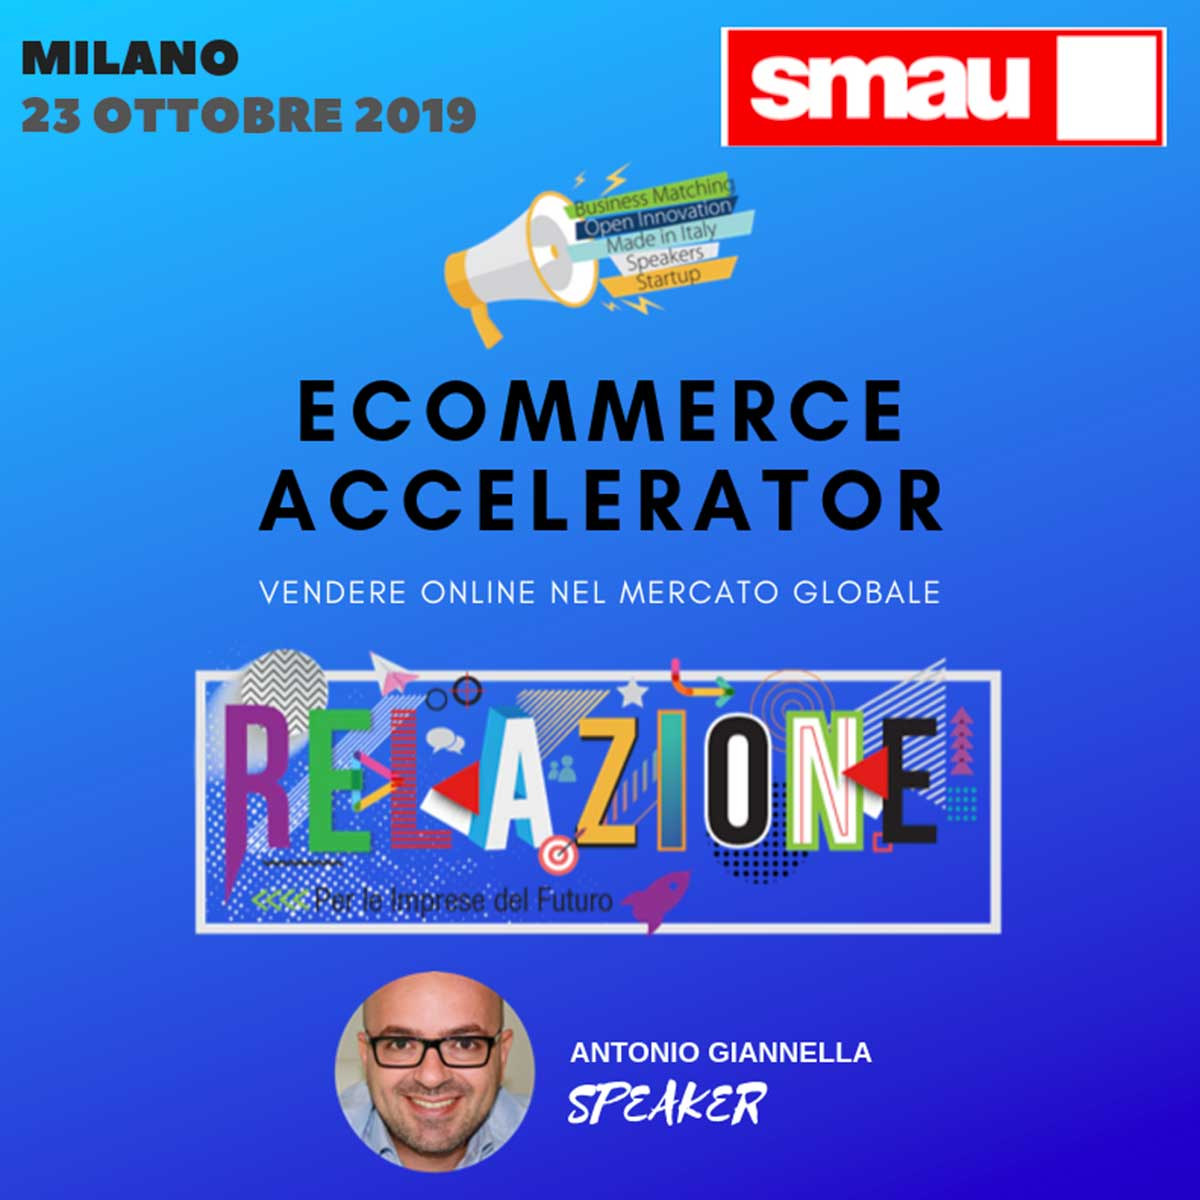 workshop smau milano 2019 giannella